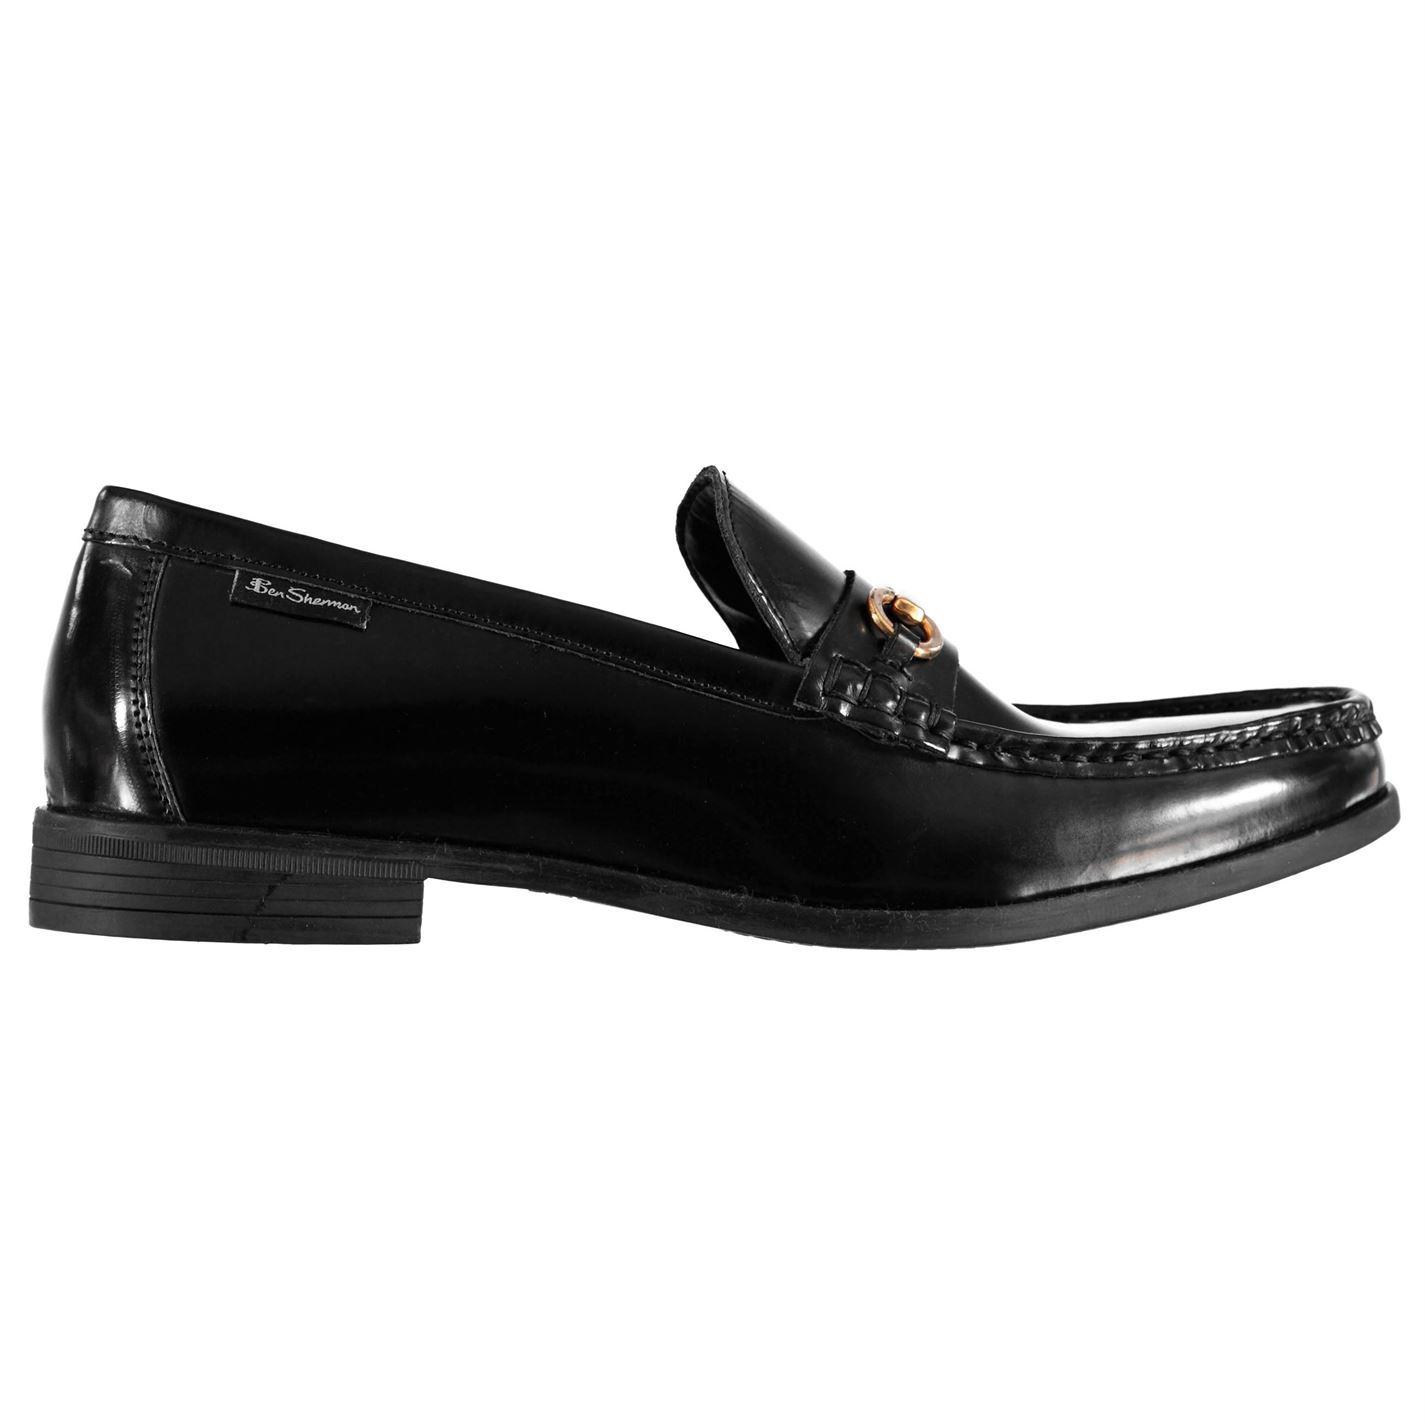 Ben-Sherman-Luca-Loafers-Slip-On-Shoes-Mens-Formal-Footwear-Flats thumbnail 3